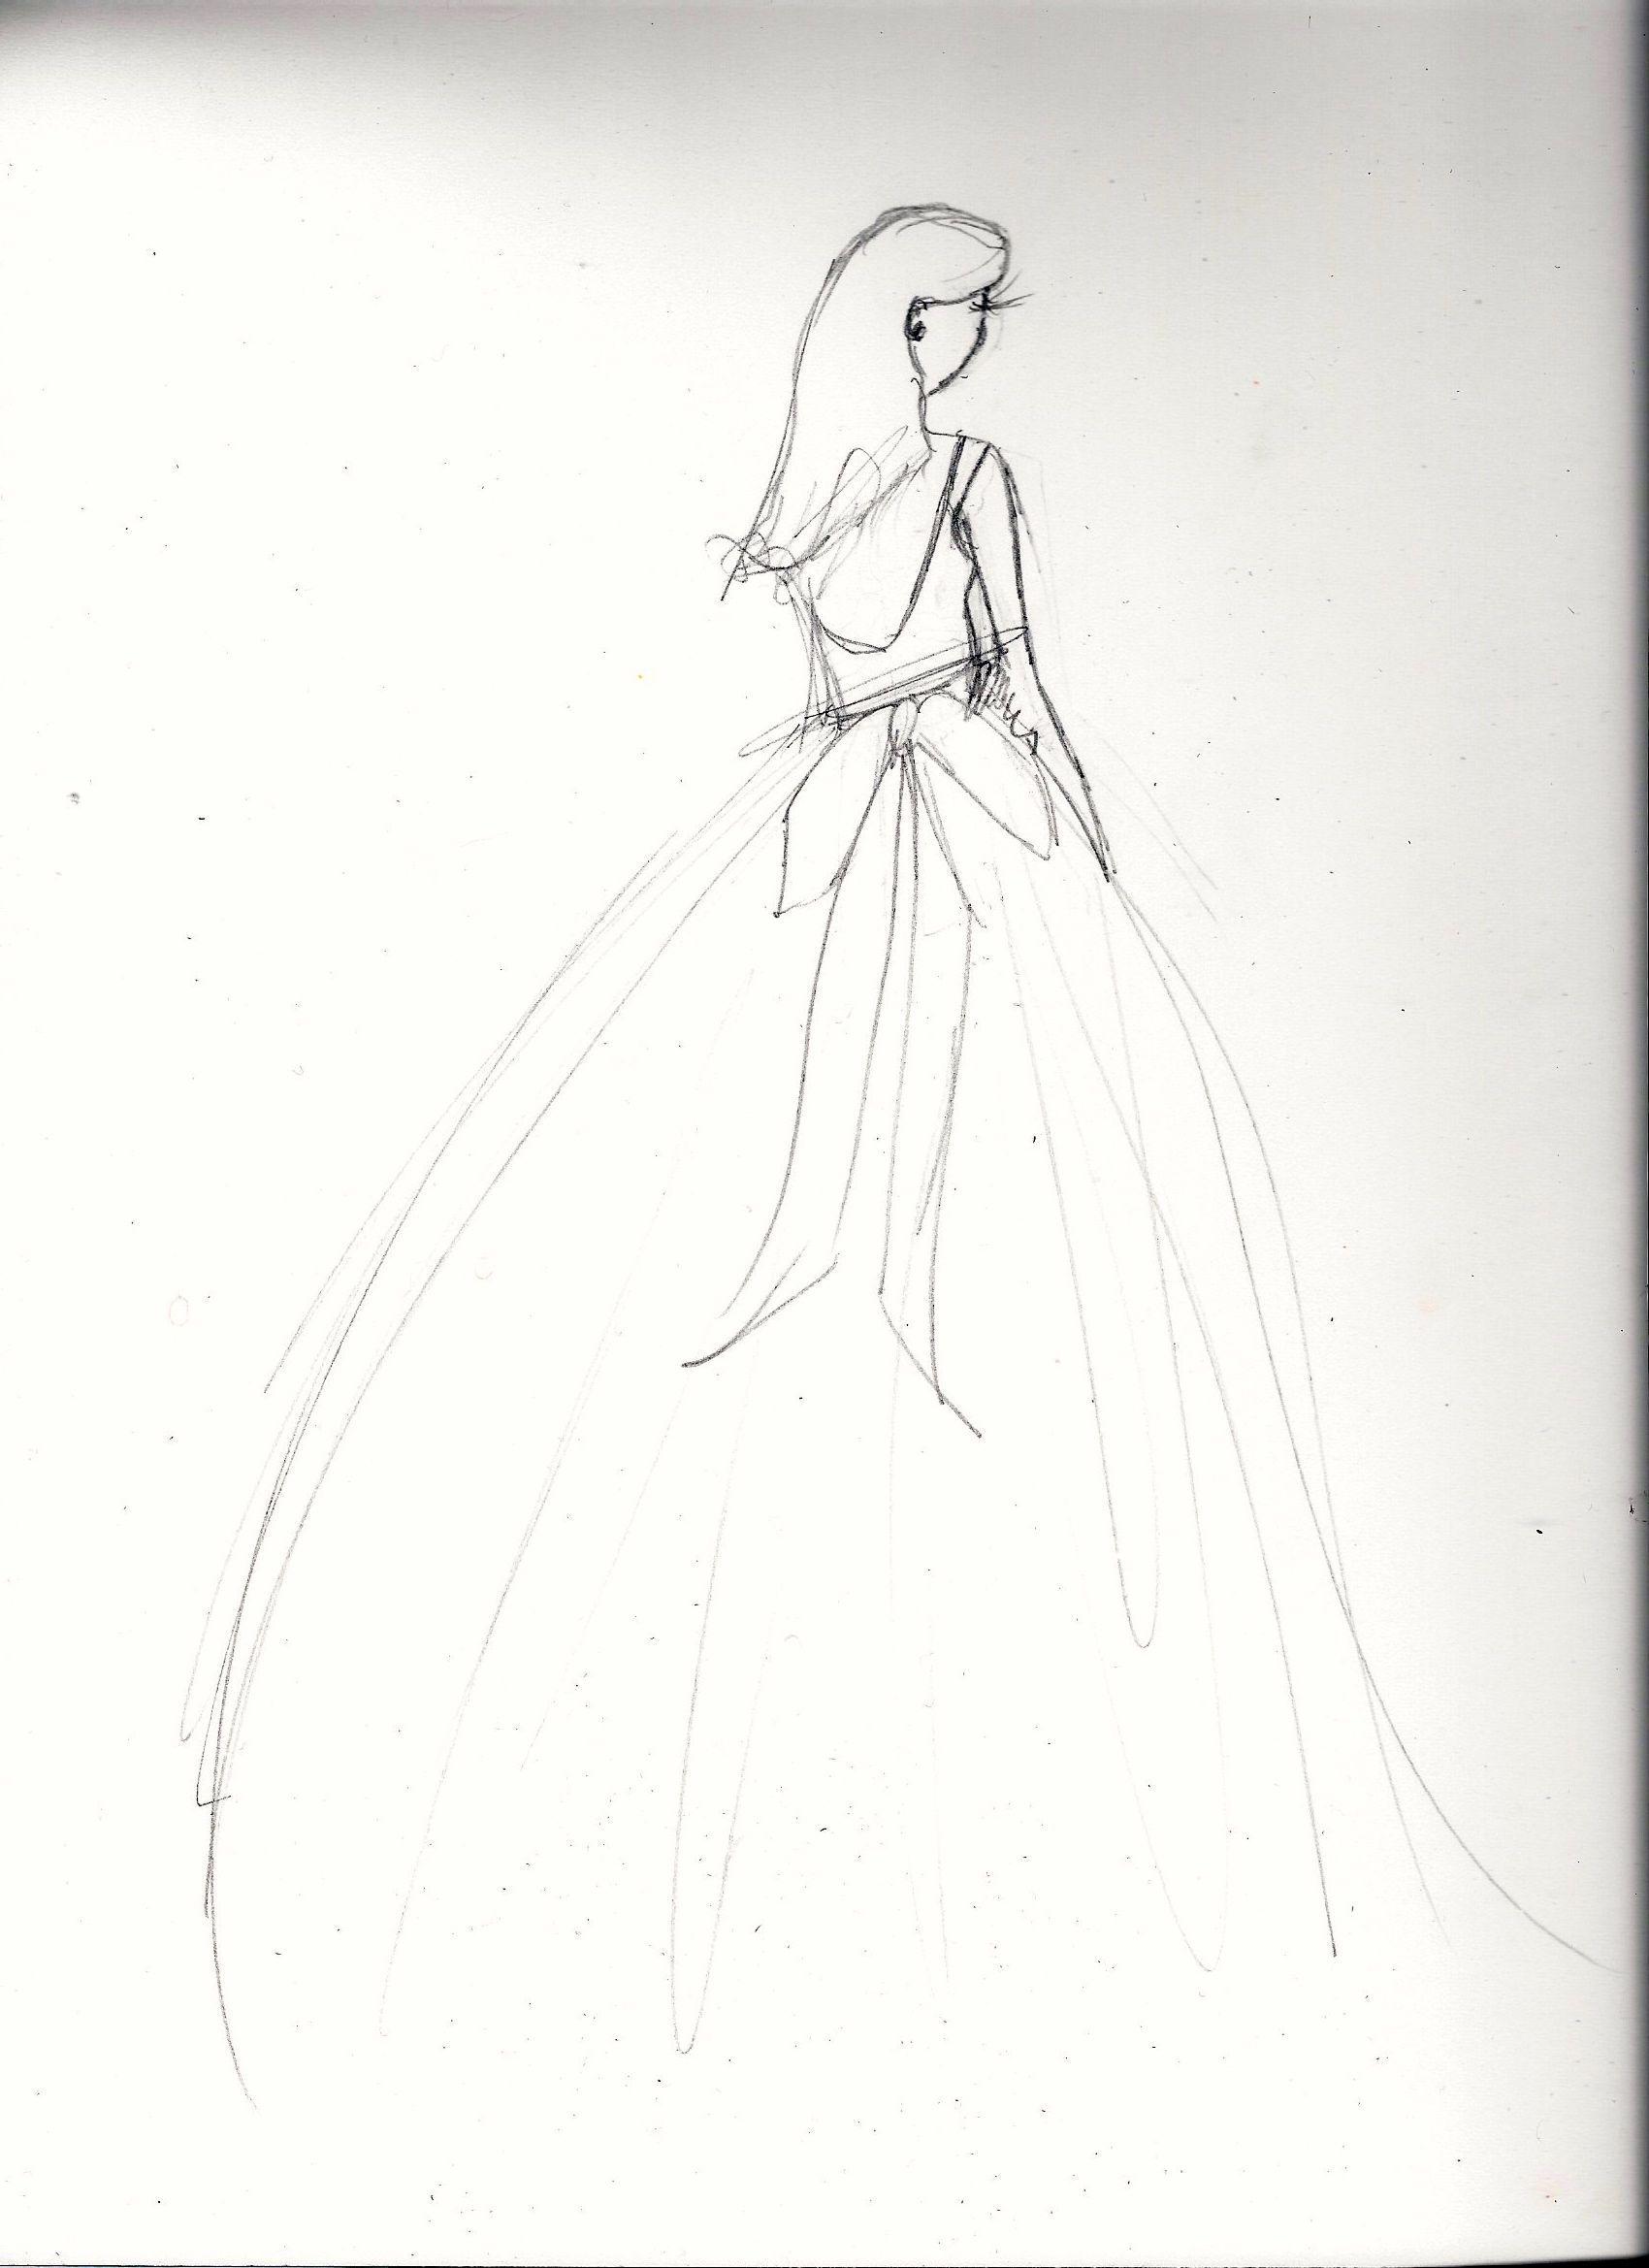 FINAL embellishment/watercolor Melissa Nadine fashion illustration - image 5 - student project